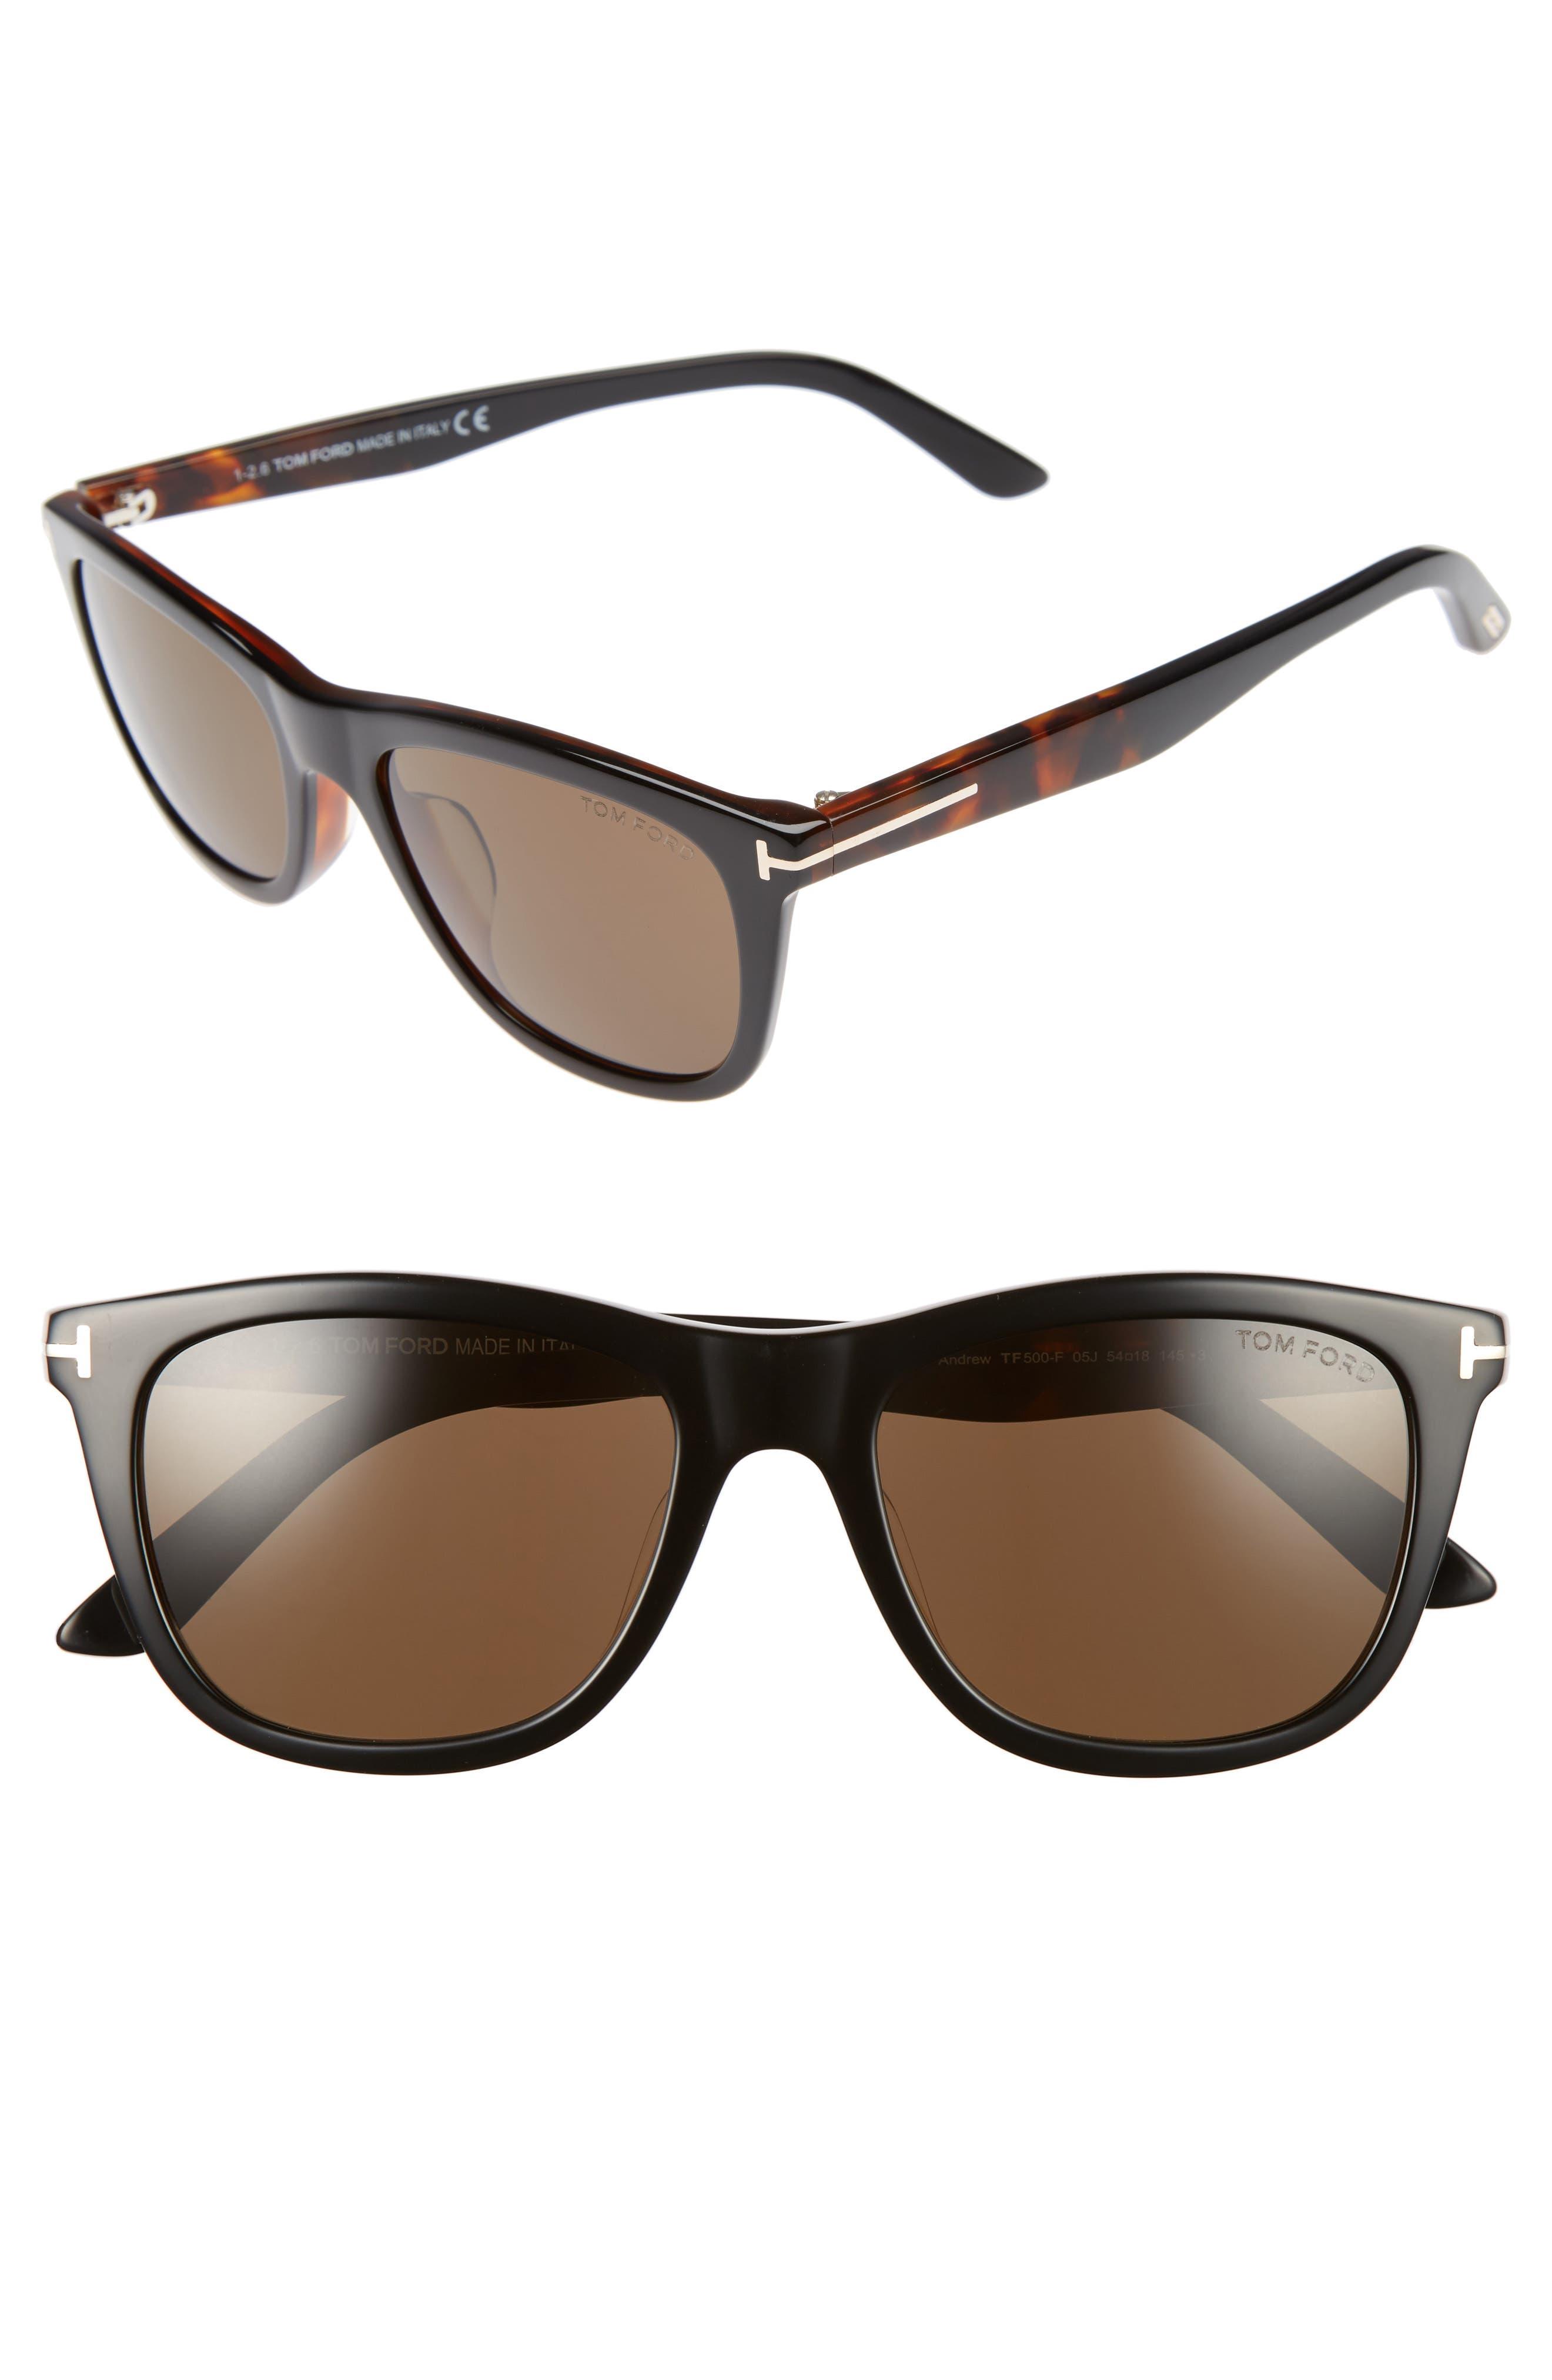 Main Image - Tom Ford Andrew 54mm Rectangular Sunglasses